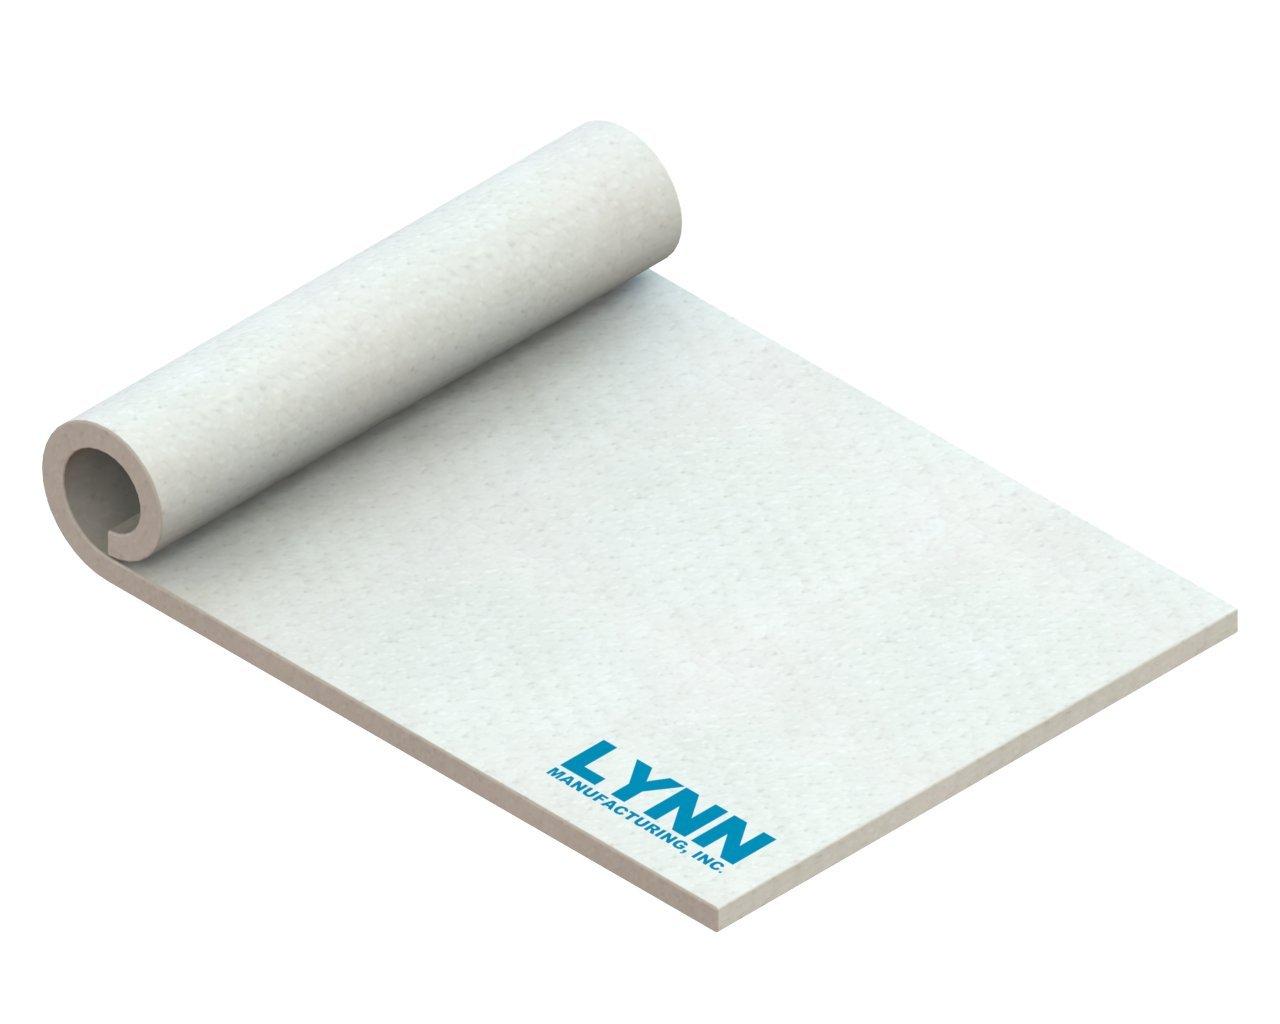 Lynn Manufacturing Replacement Hearthstone Ceramic Baffle Blanket, Phoenix 8612, 3120-210 by Lynn Manufacturing